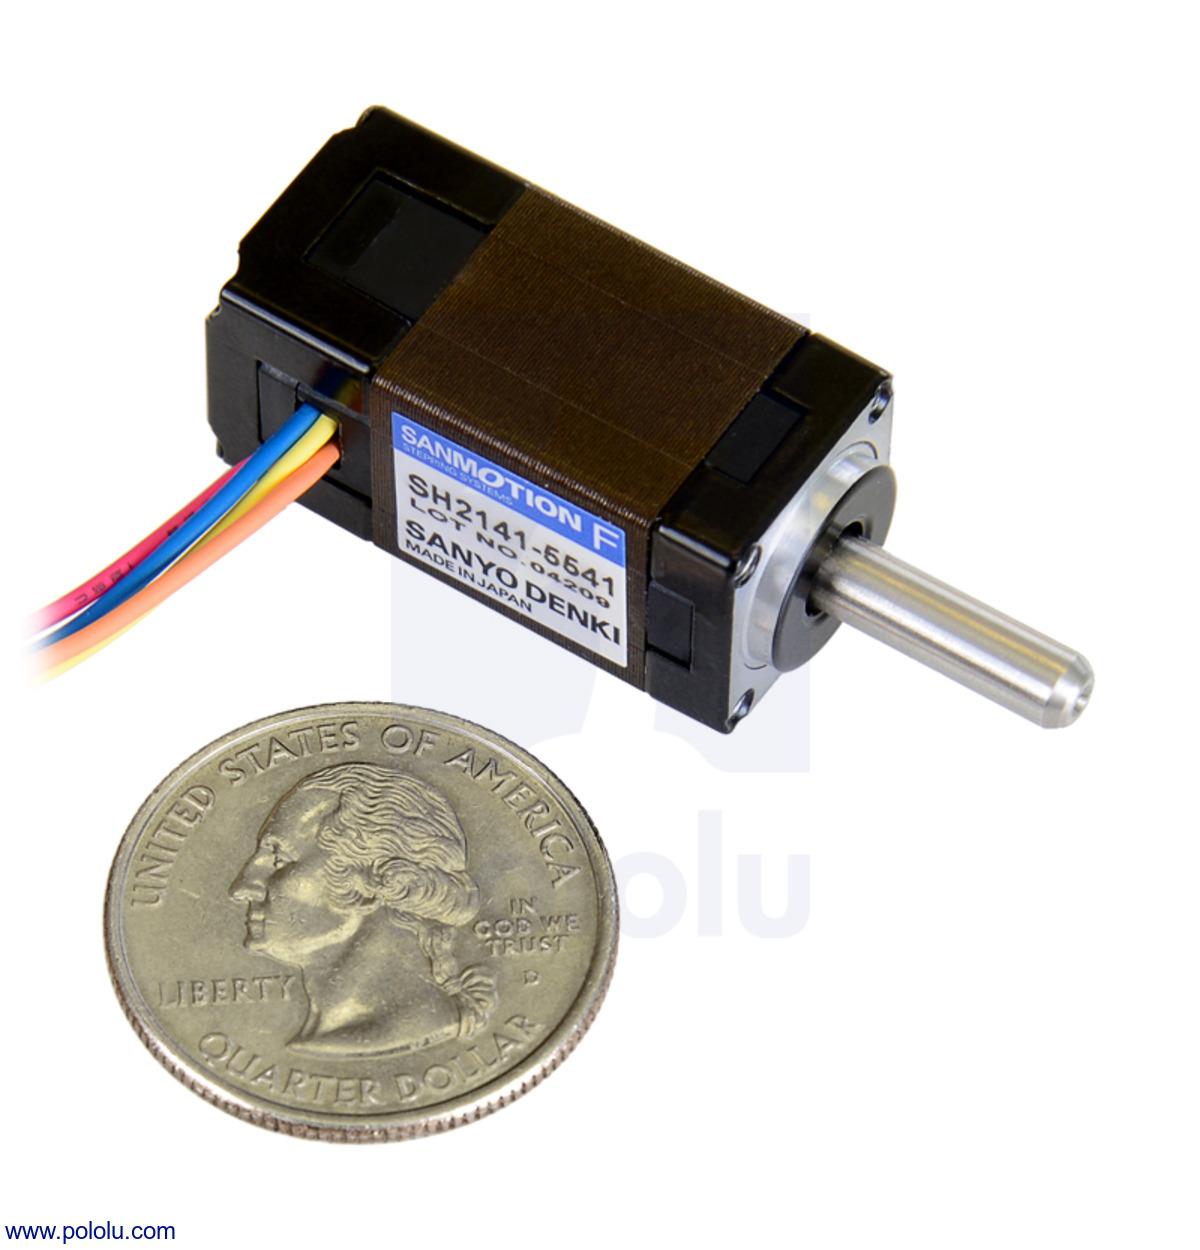 Pololu Sanyo Miniature Stepper Motor Bipolar 200 Steps Rev 14 Micro Servo Wiring Diagram Previous